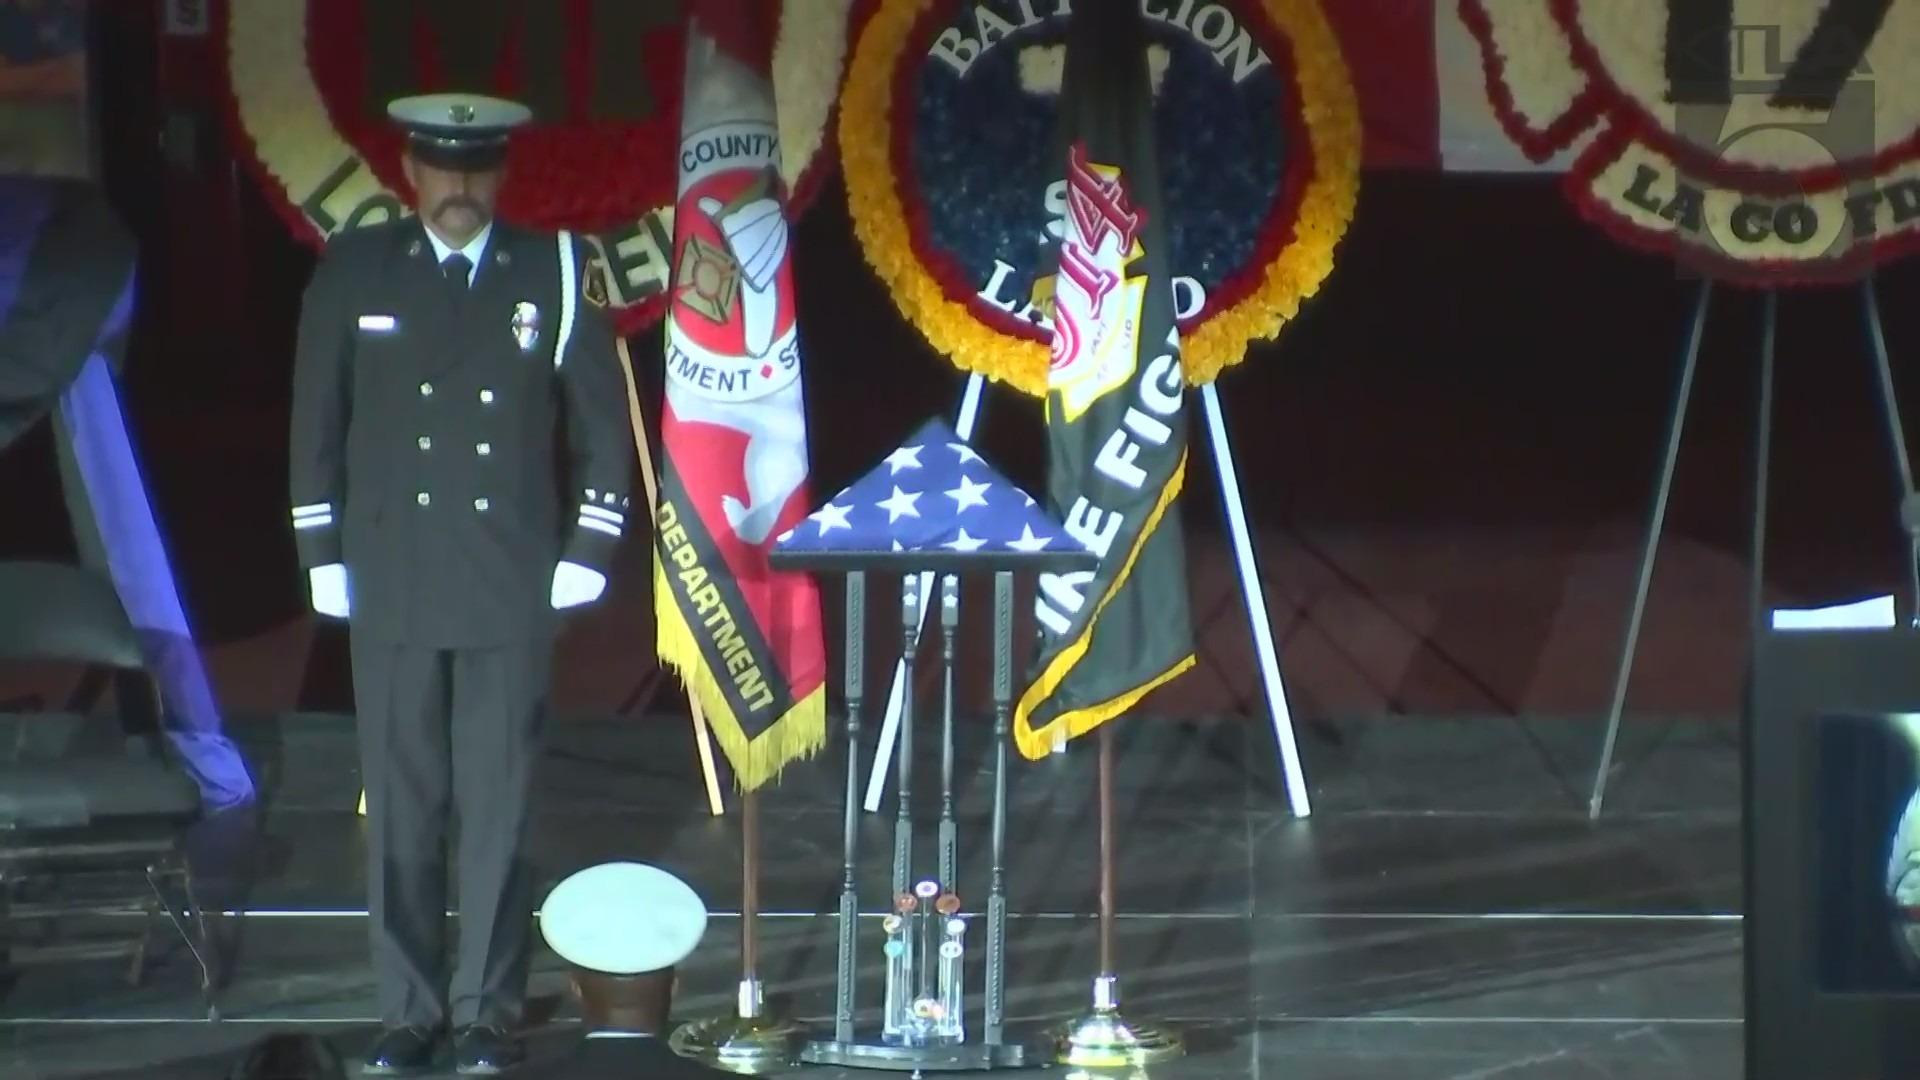 Tory Carlon is honored prior to his memorial on June 17, 2021. (KTLA)